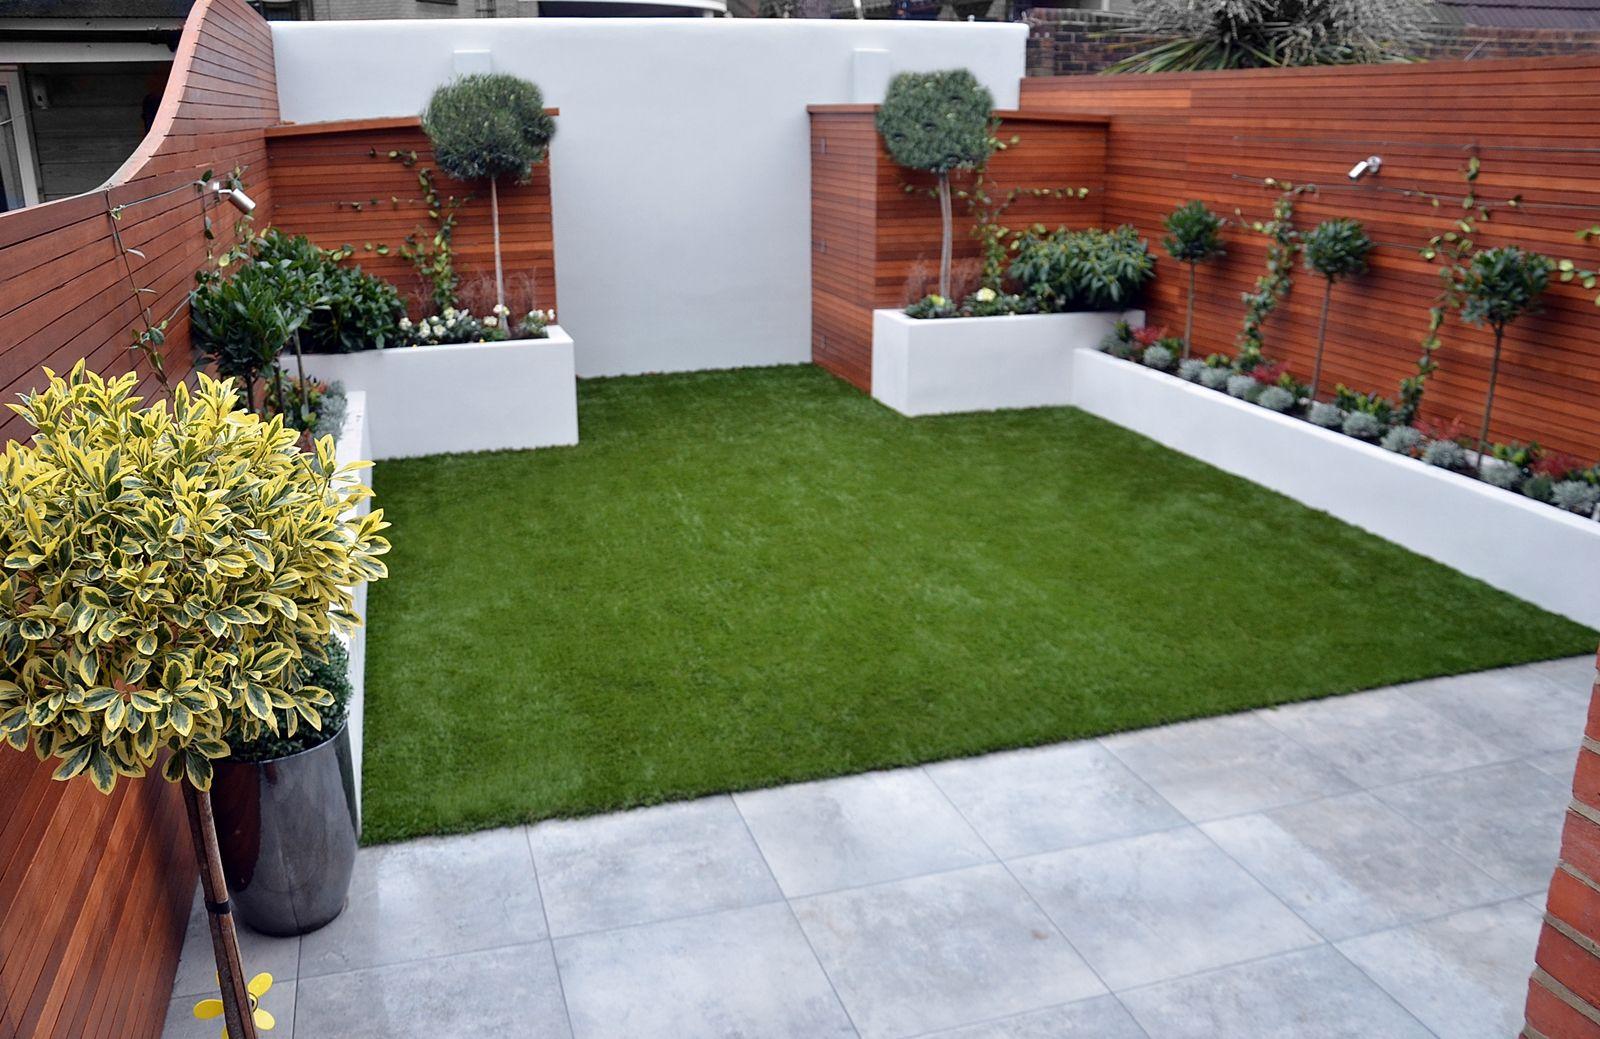 London Garden Designer | Back garden design, Courtyard ... on Modern Small Backyard Ideas id=71070